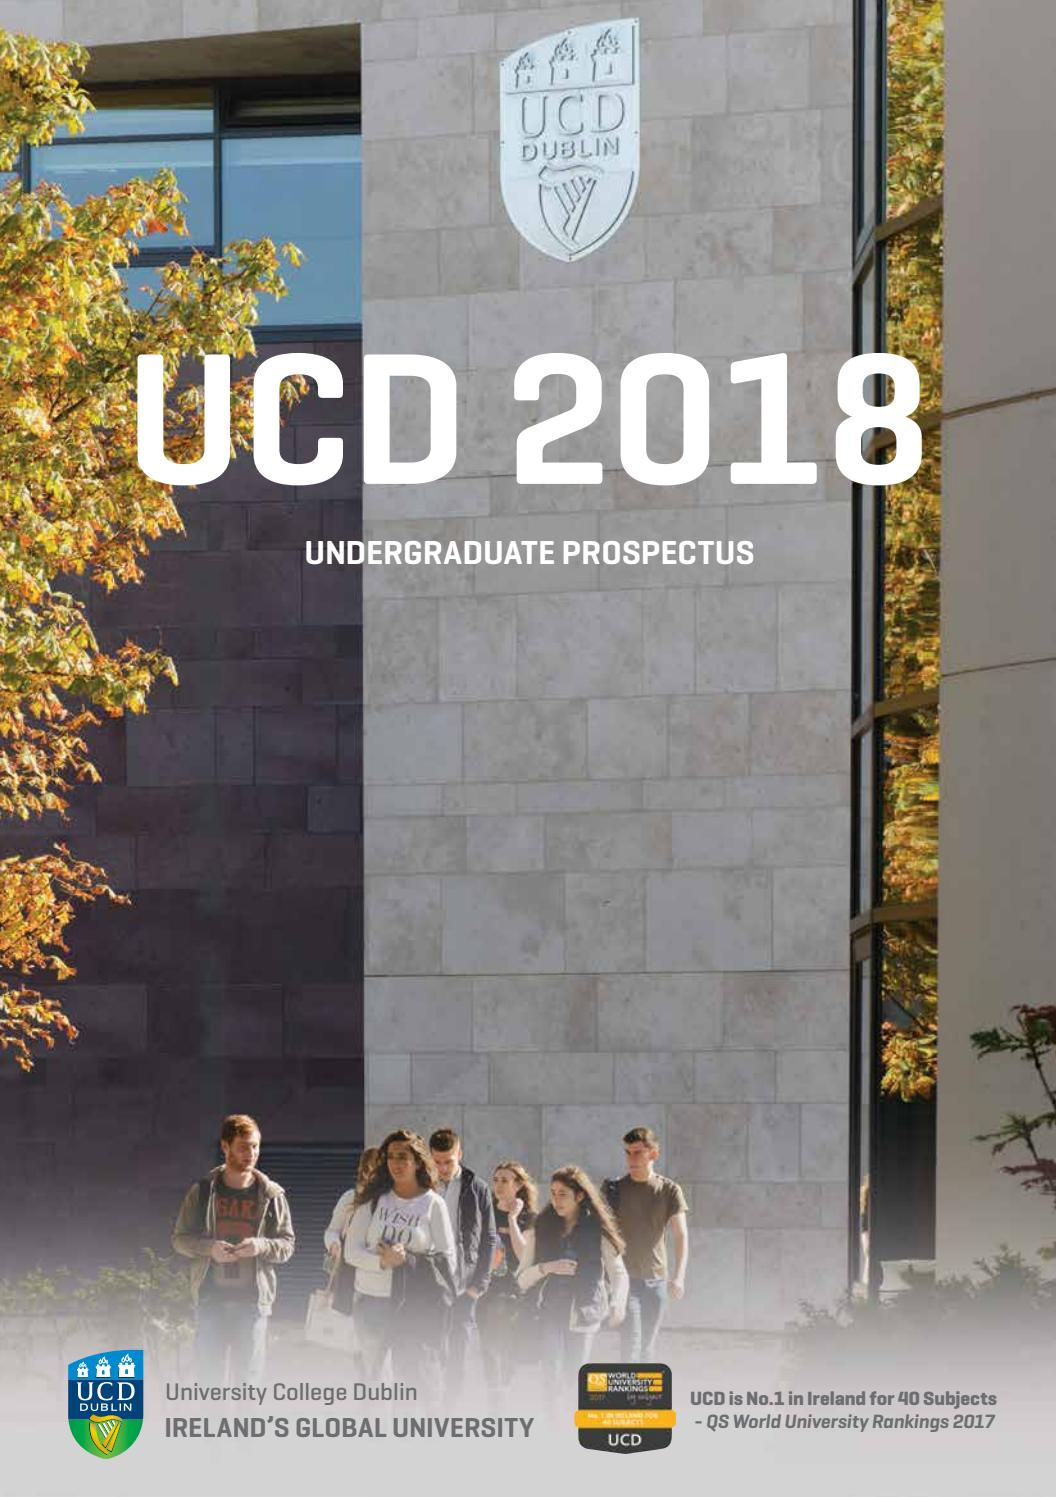 UCD Prospectus 2018 by Rooney Media - issuu